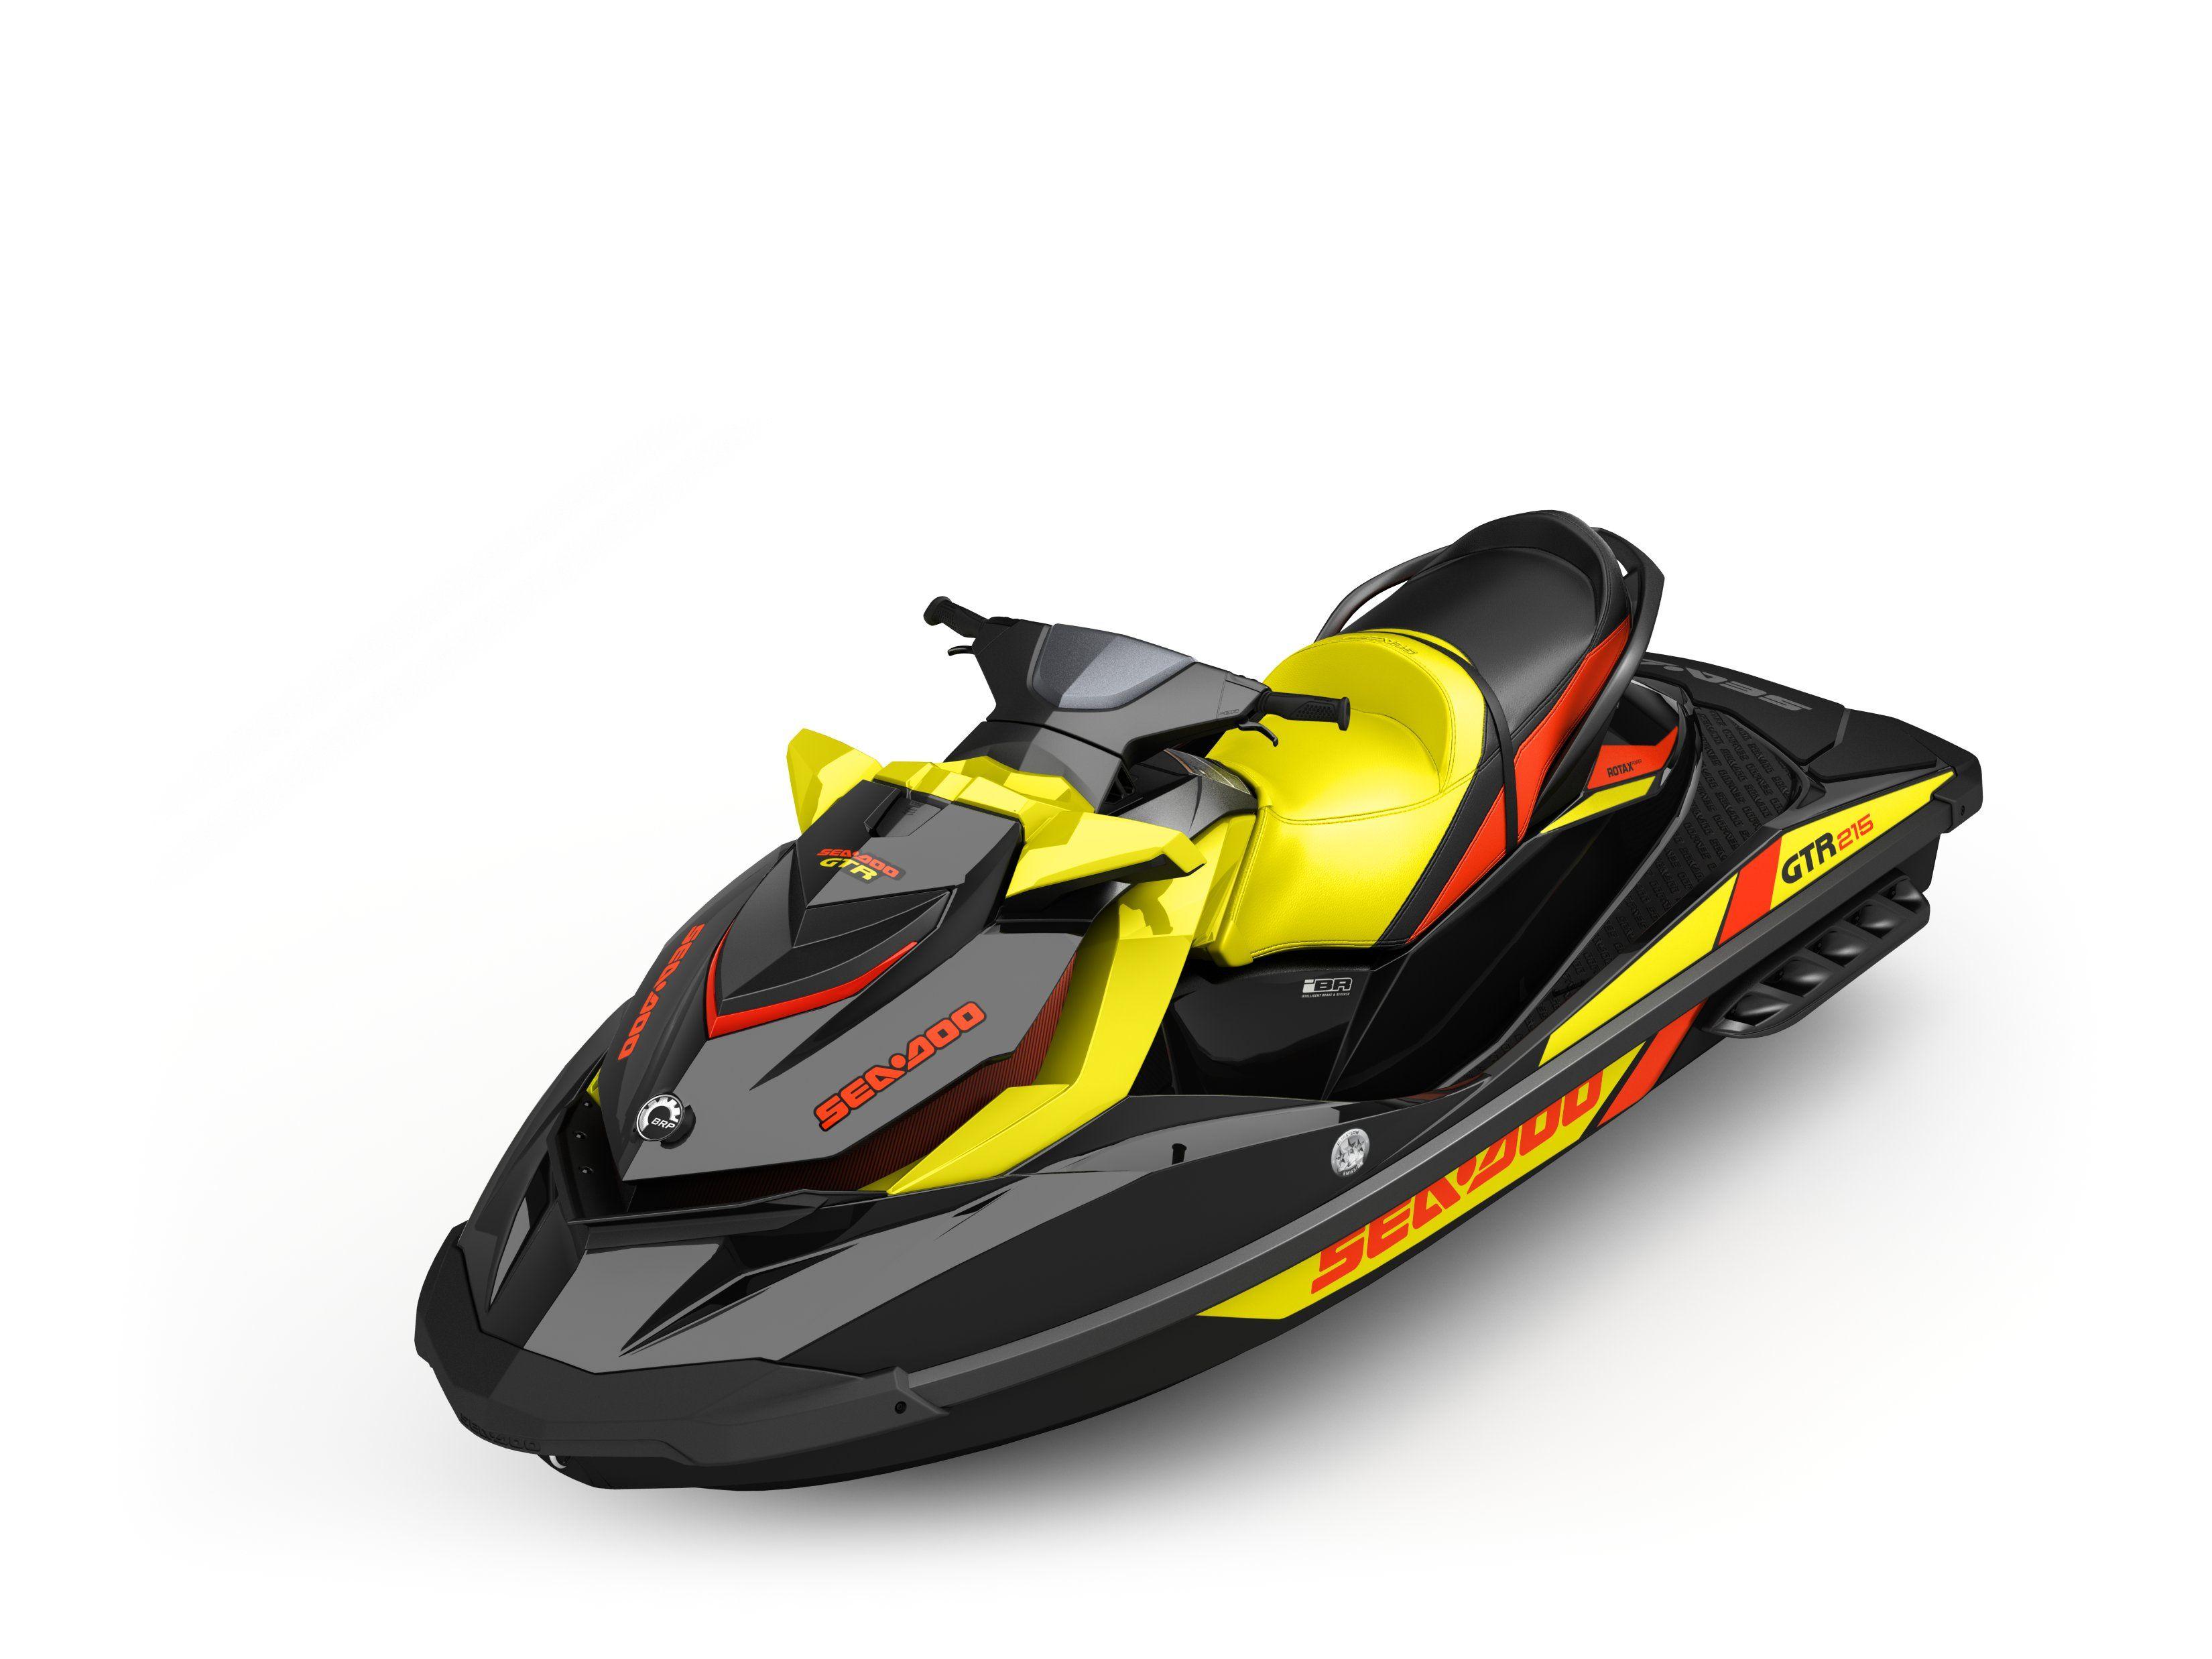 11++ Yar craft boats for sale in south dakota information